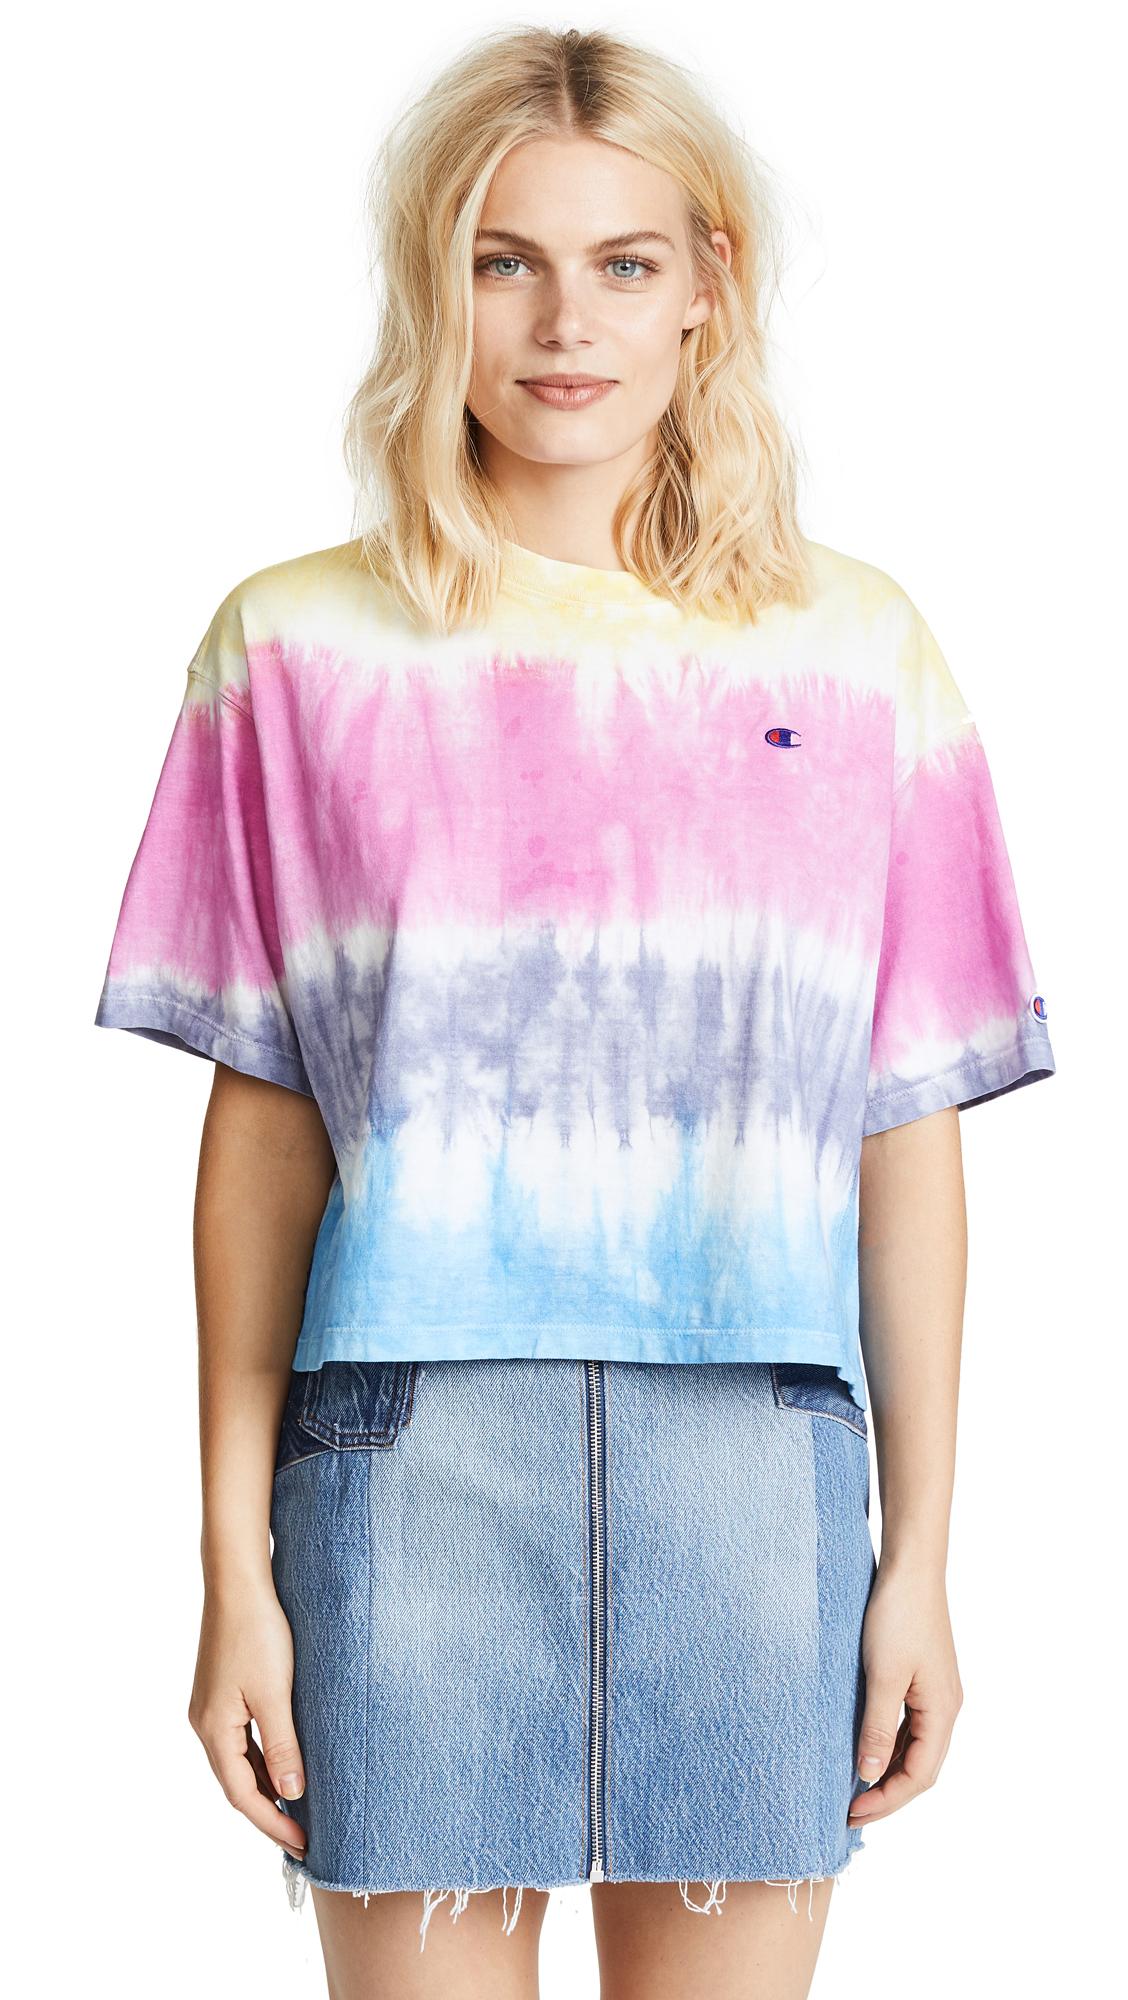 Champion Premium Reverse Weave Oversize T-Shirt - Coral/Pink/Pink/Blue